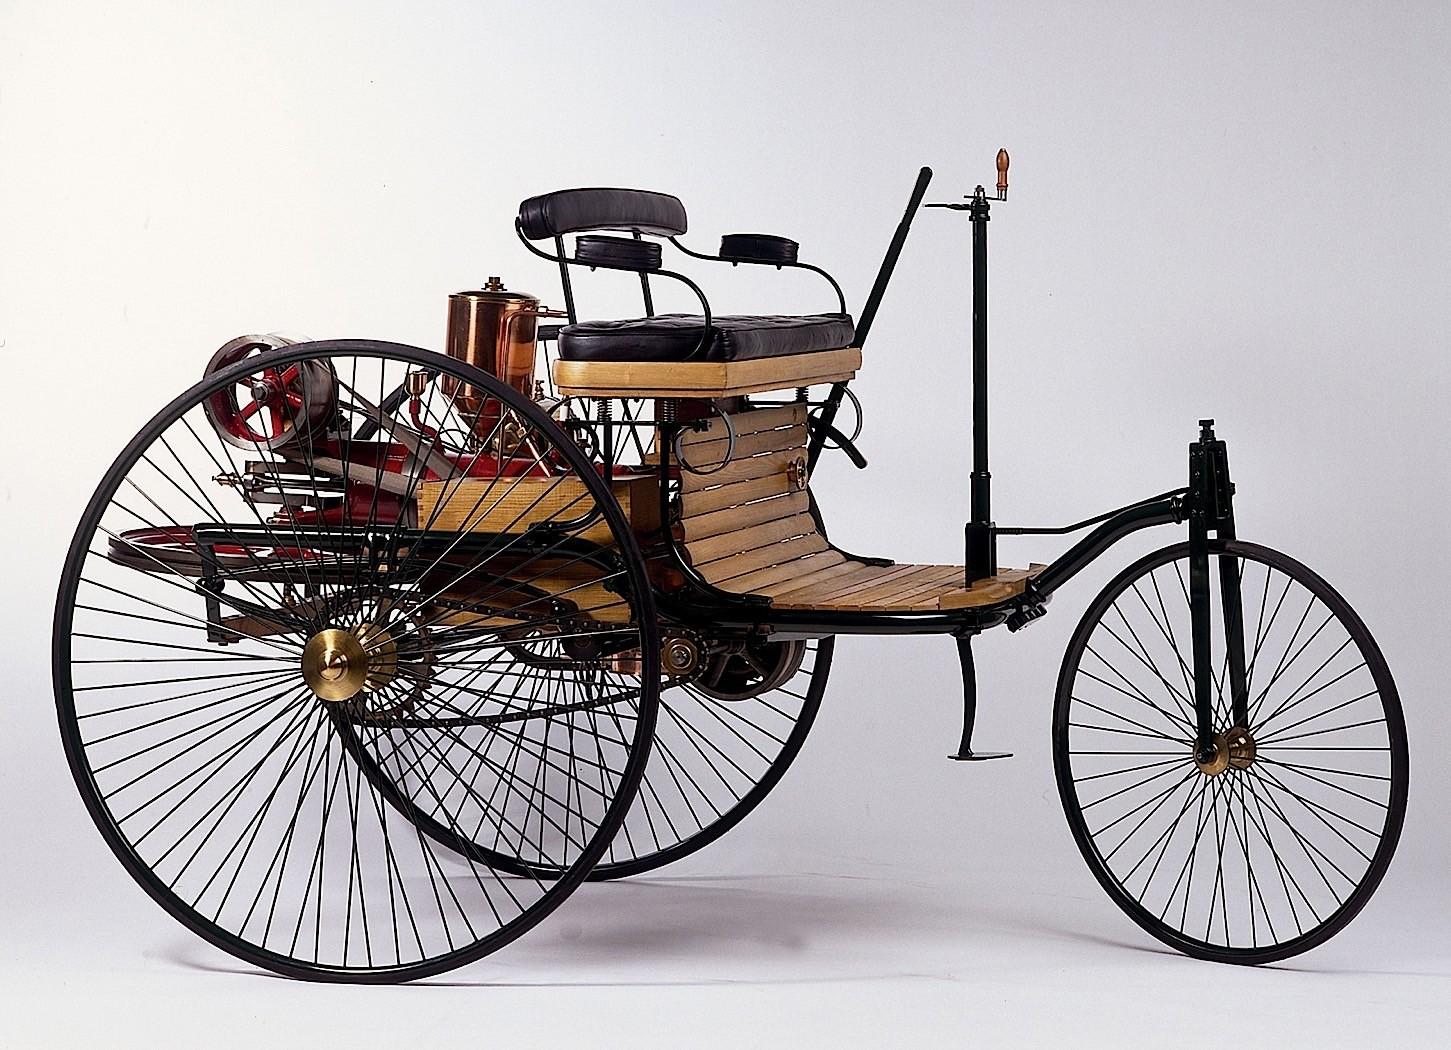 Mercedes-Benz Celebrates 130 Years of Modern Automobiles - autoevolution